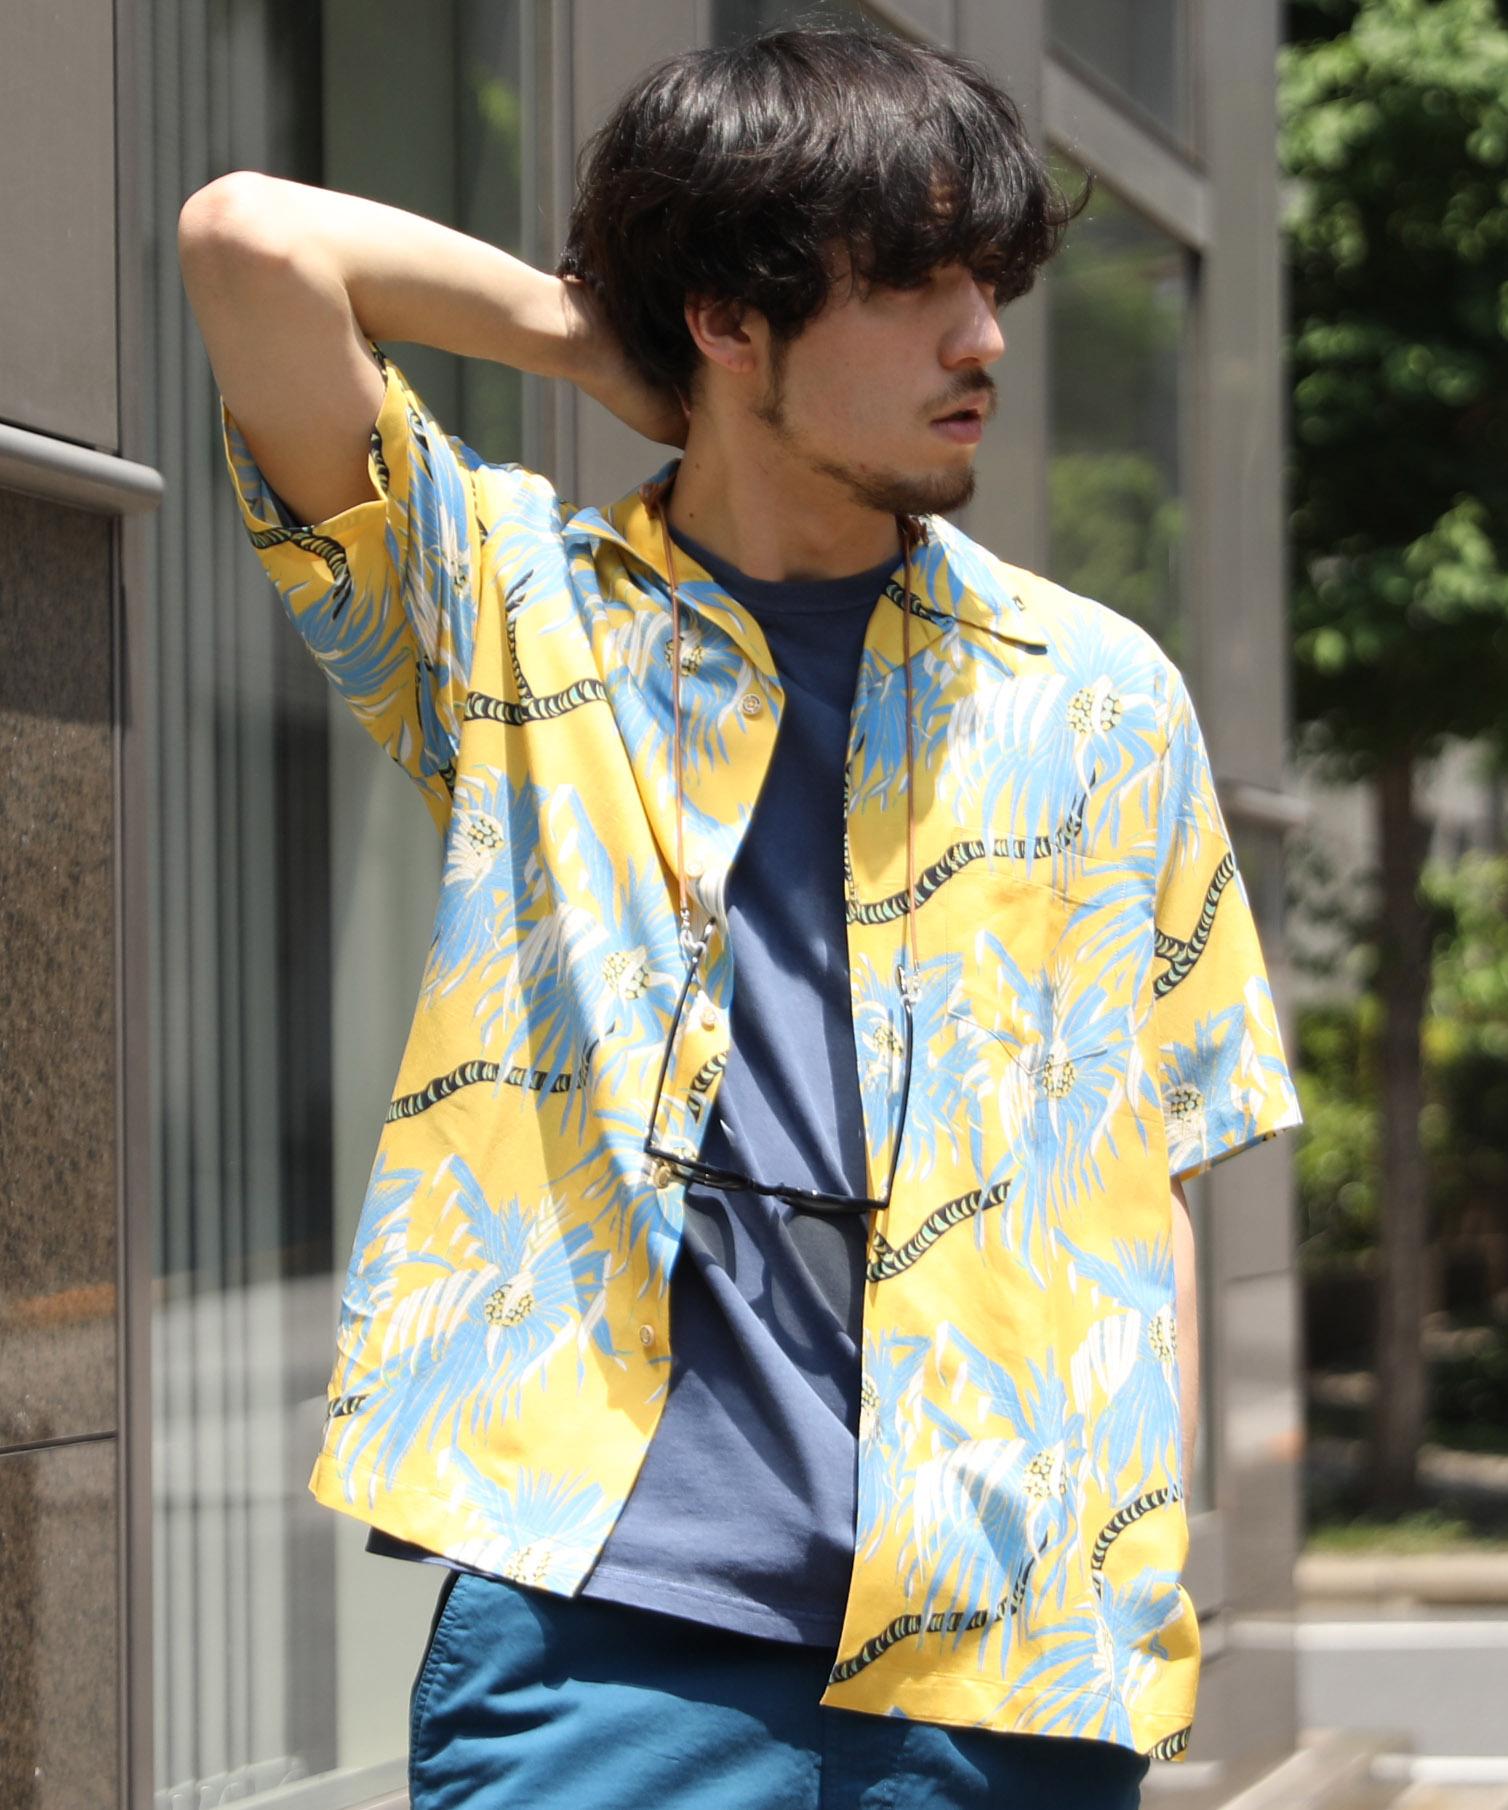 reyn spooner x ARC レインスプーナー アメリカンラグシー別注 / OPEN COLLAR SHIRT オープンカラーシャツ